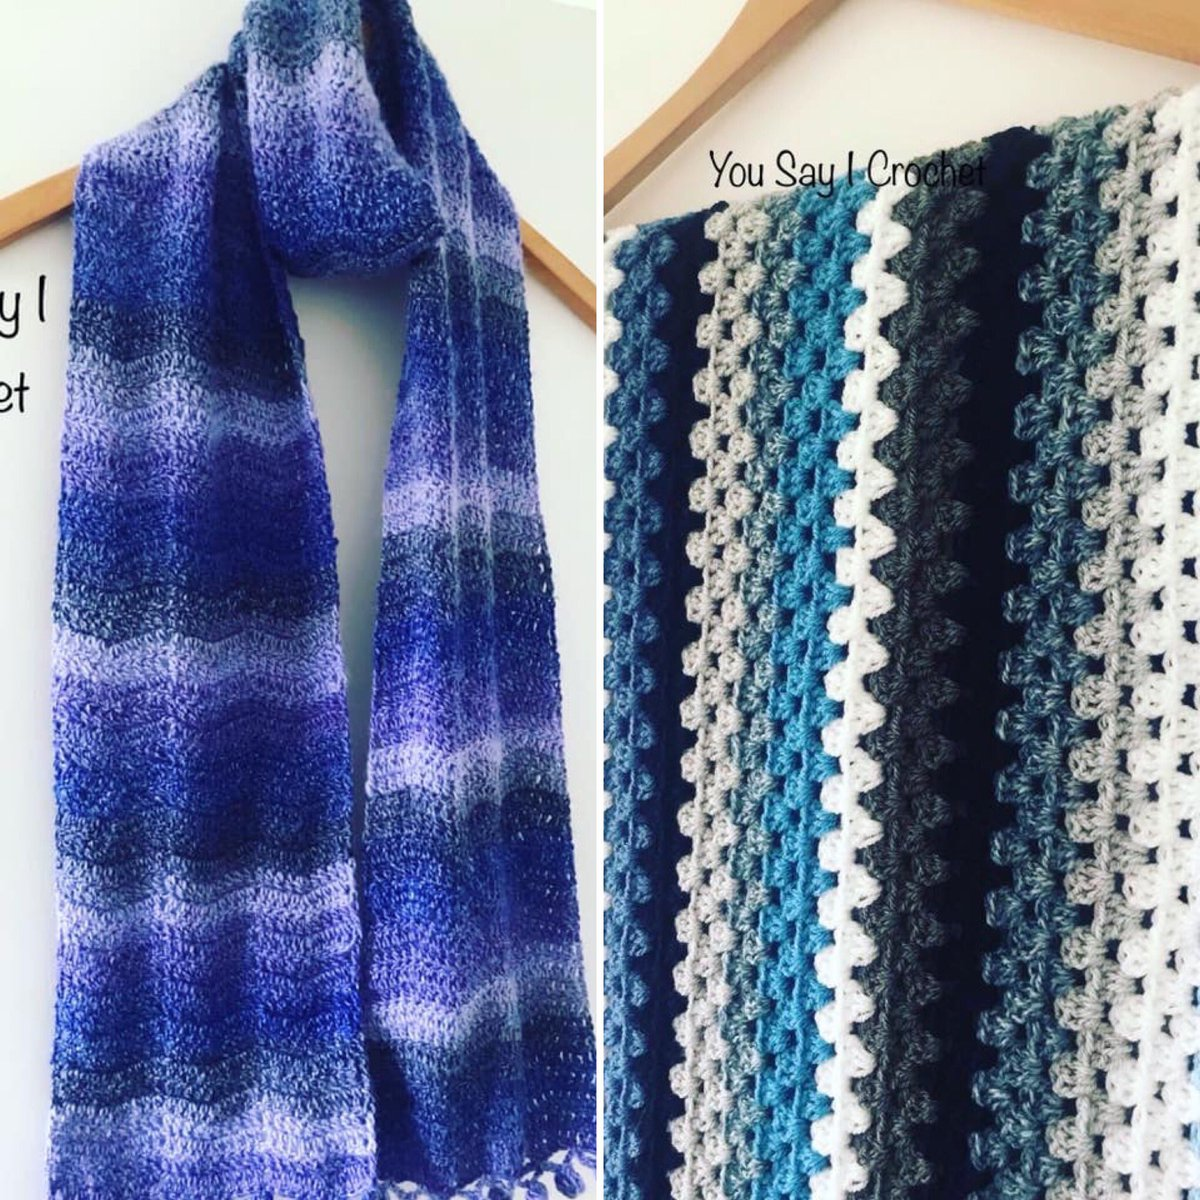 Both sold today #etsyshop #scarf #blanket #yousayicrochet #handmadehour #crafthour #crochet #selfisolation #lockdownpic.twitter.com/HOqD08ywBp